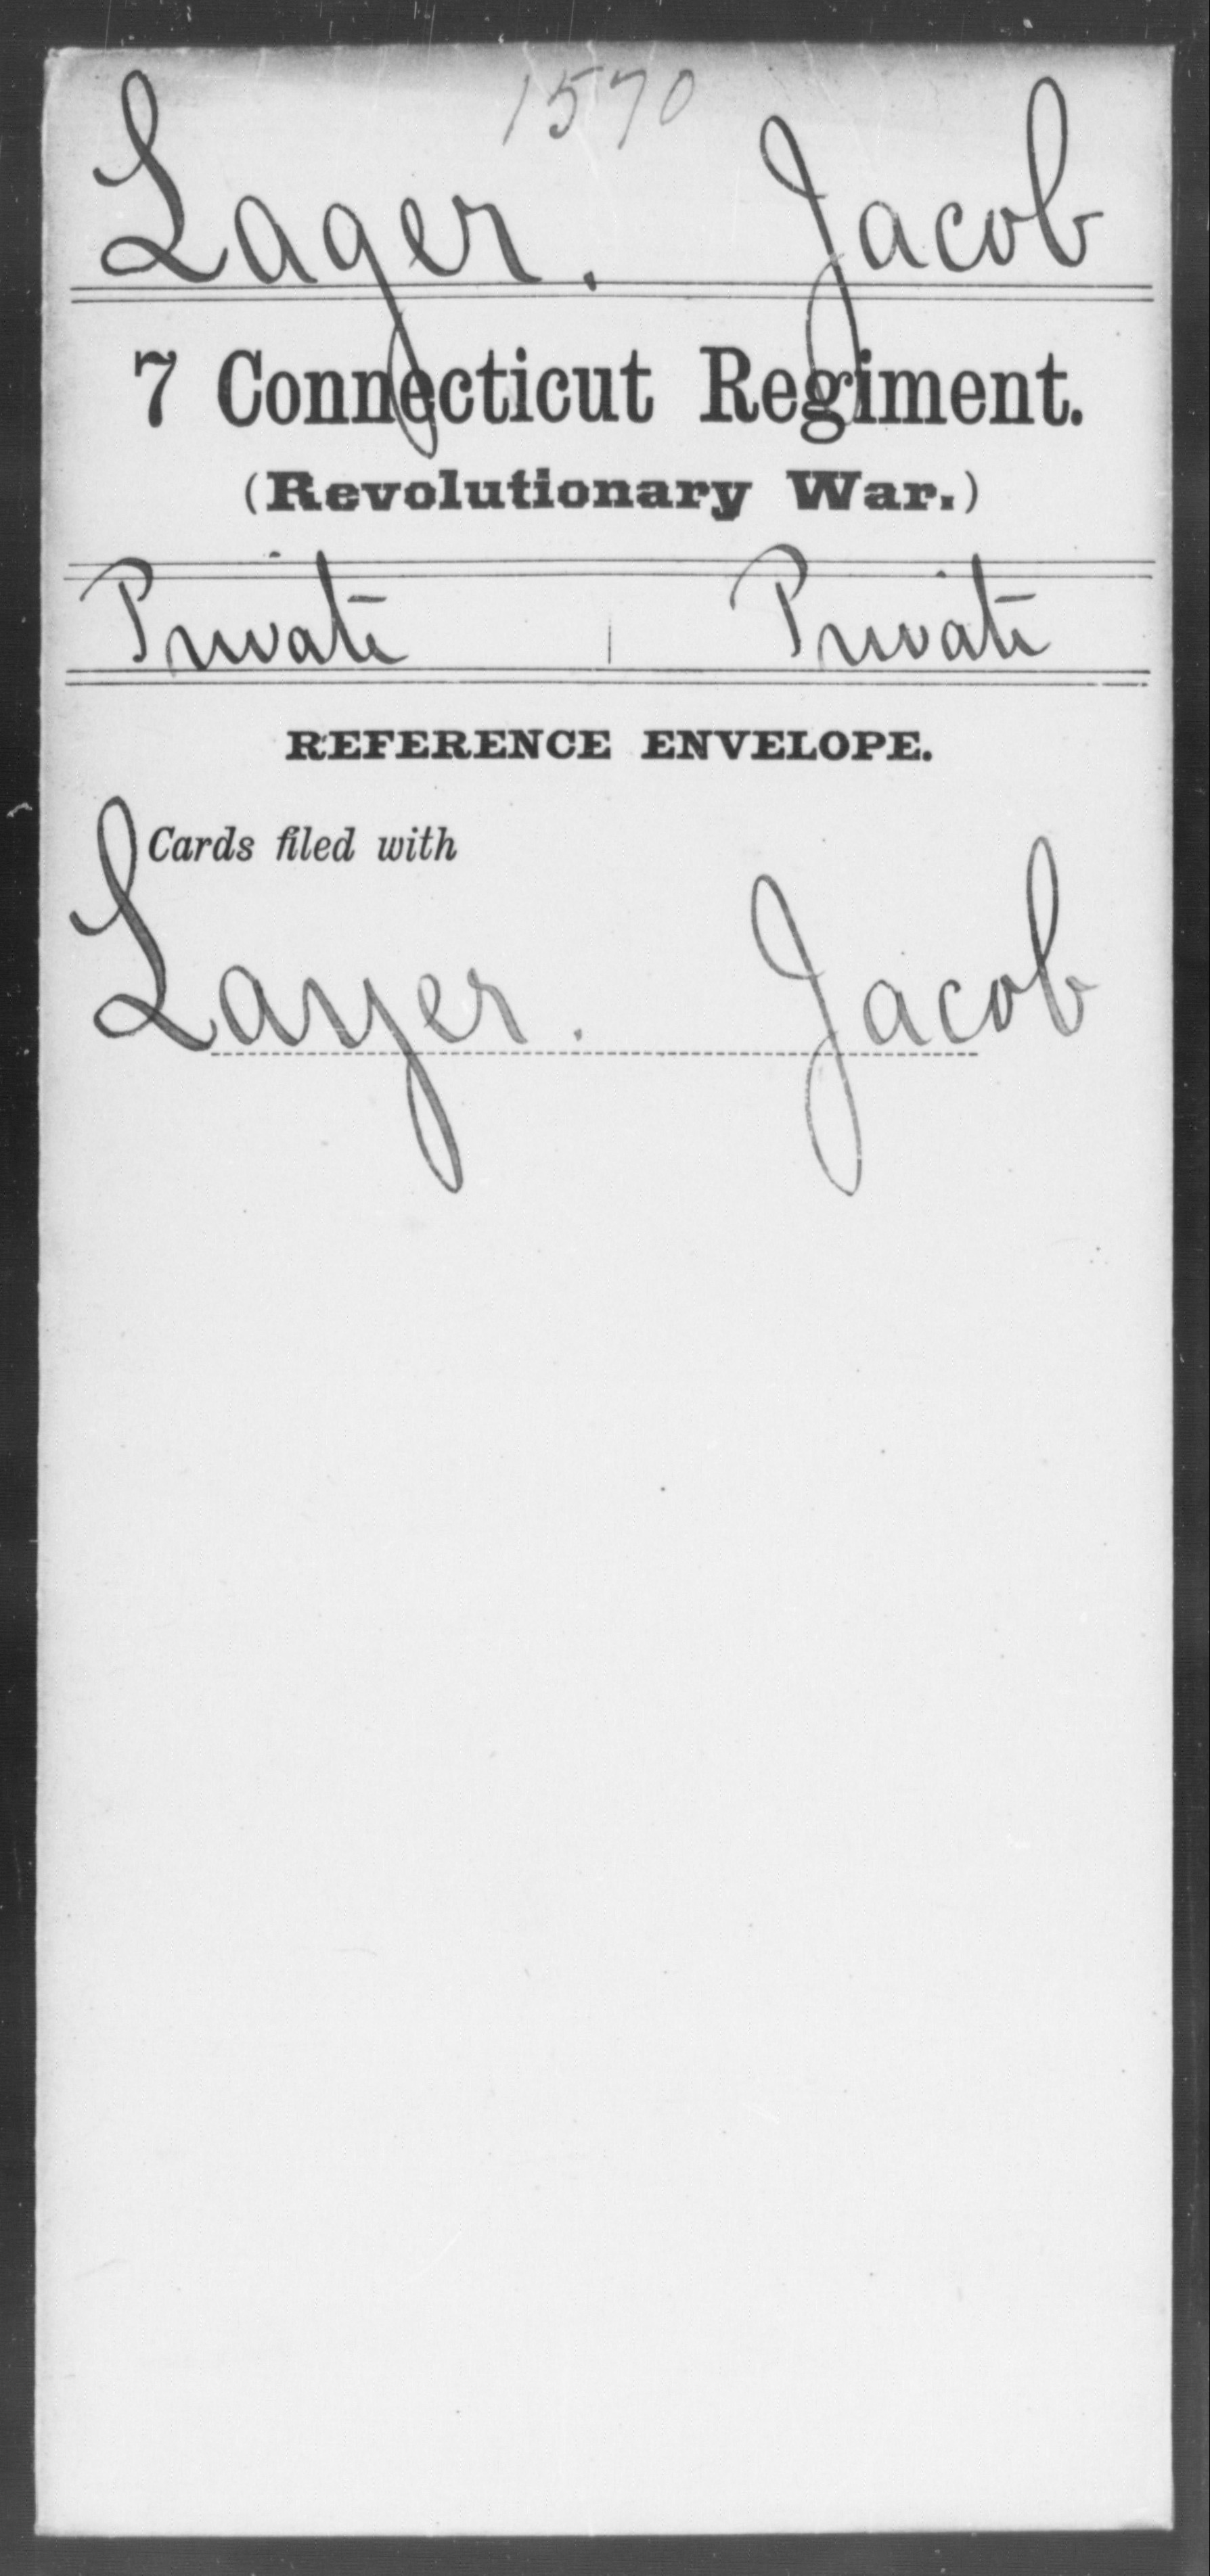 Lager, Jocob - Connecticut - Seventh Regiment